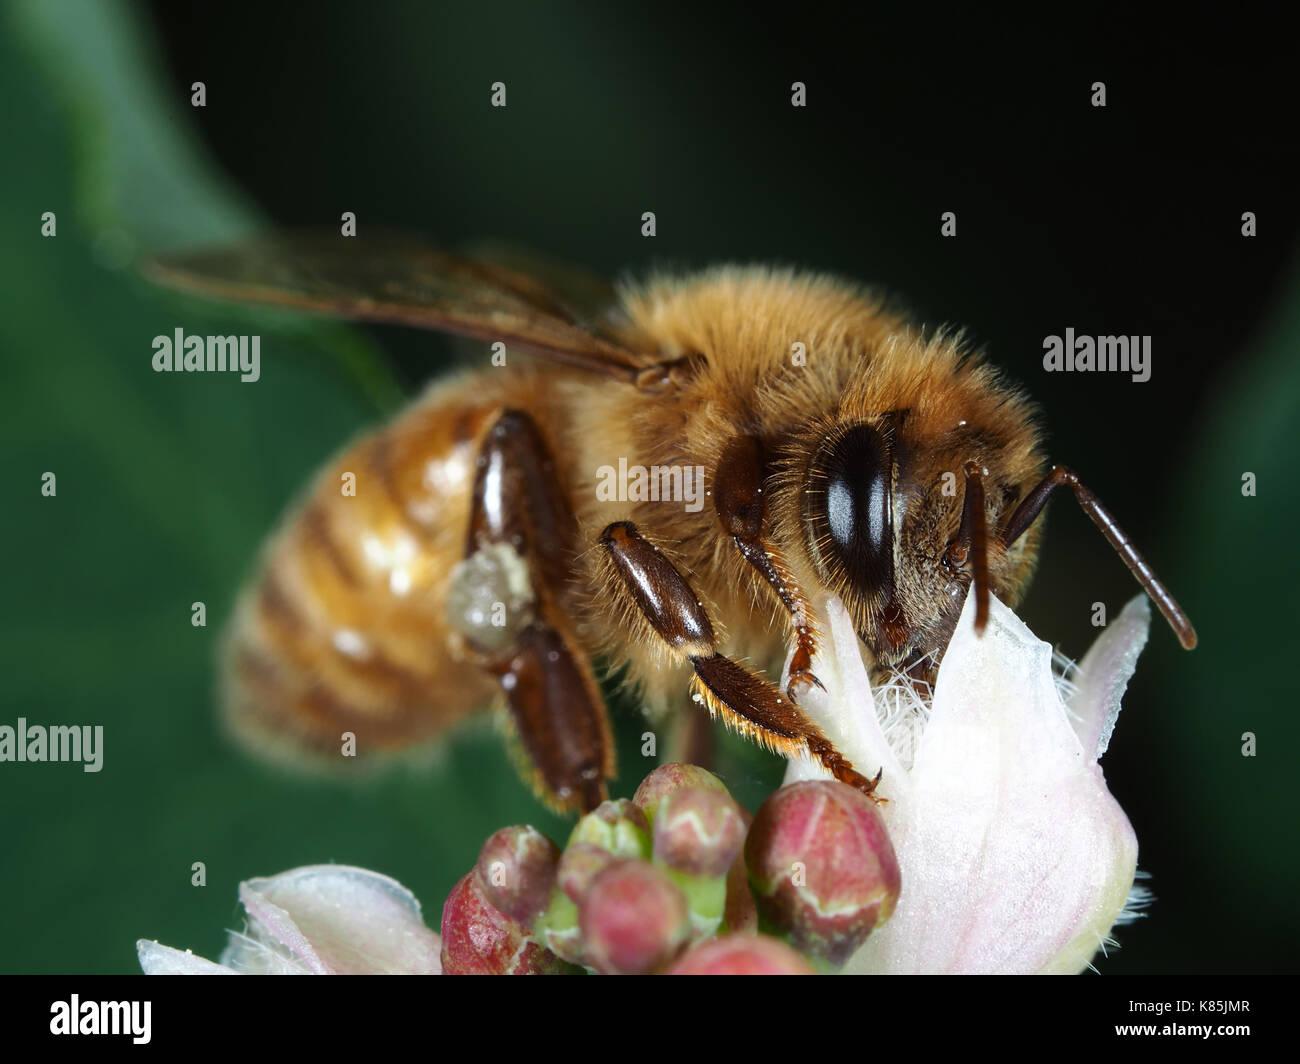 Honey bee (Apis mellifera) gathering pollen on a white flower in Kirkland, WA, USA - Stock Image